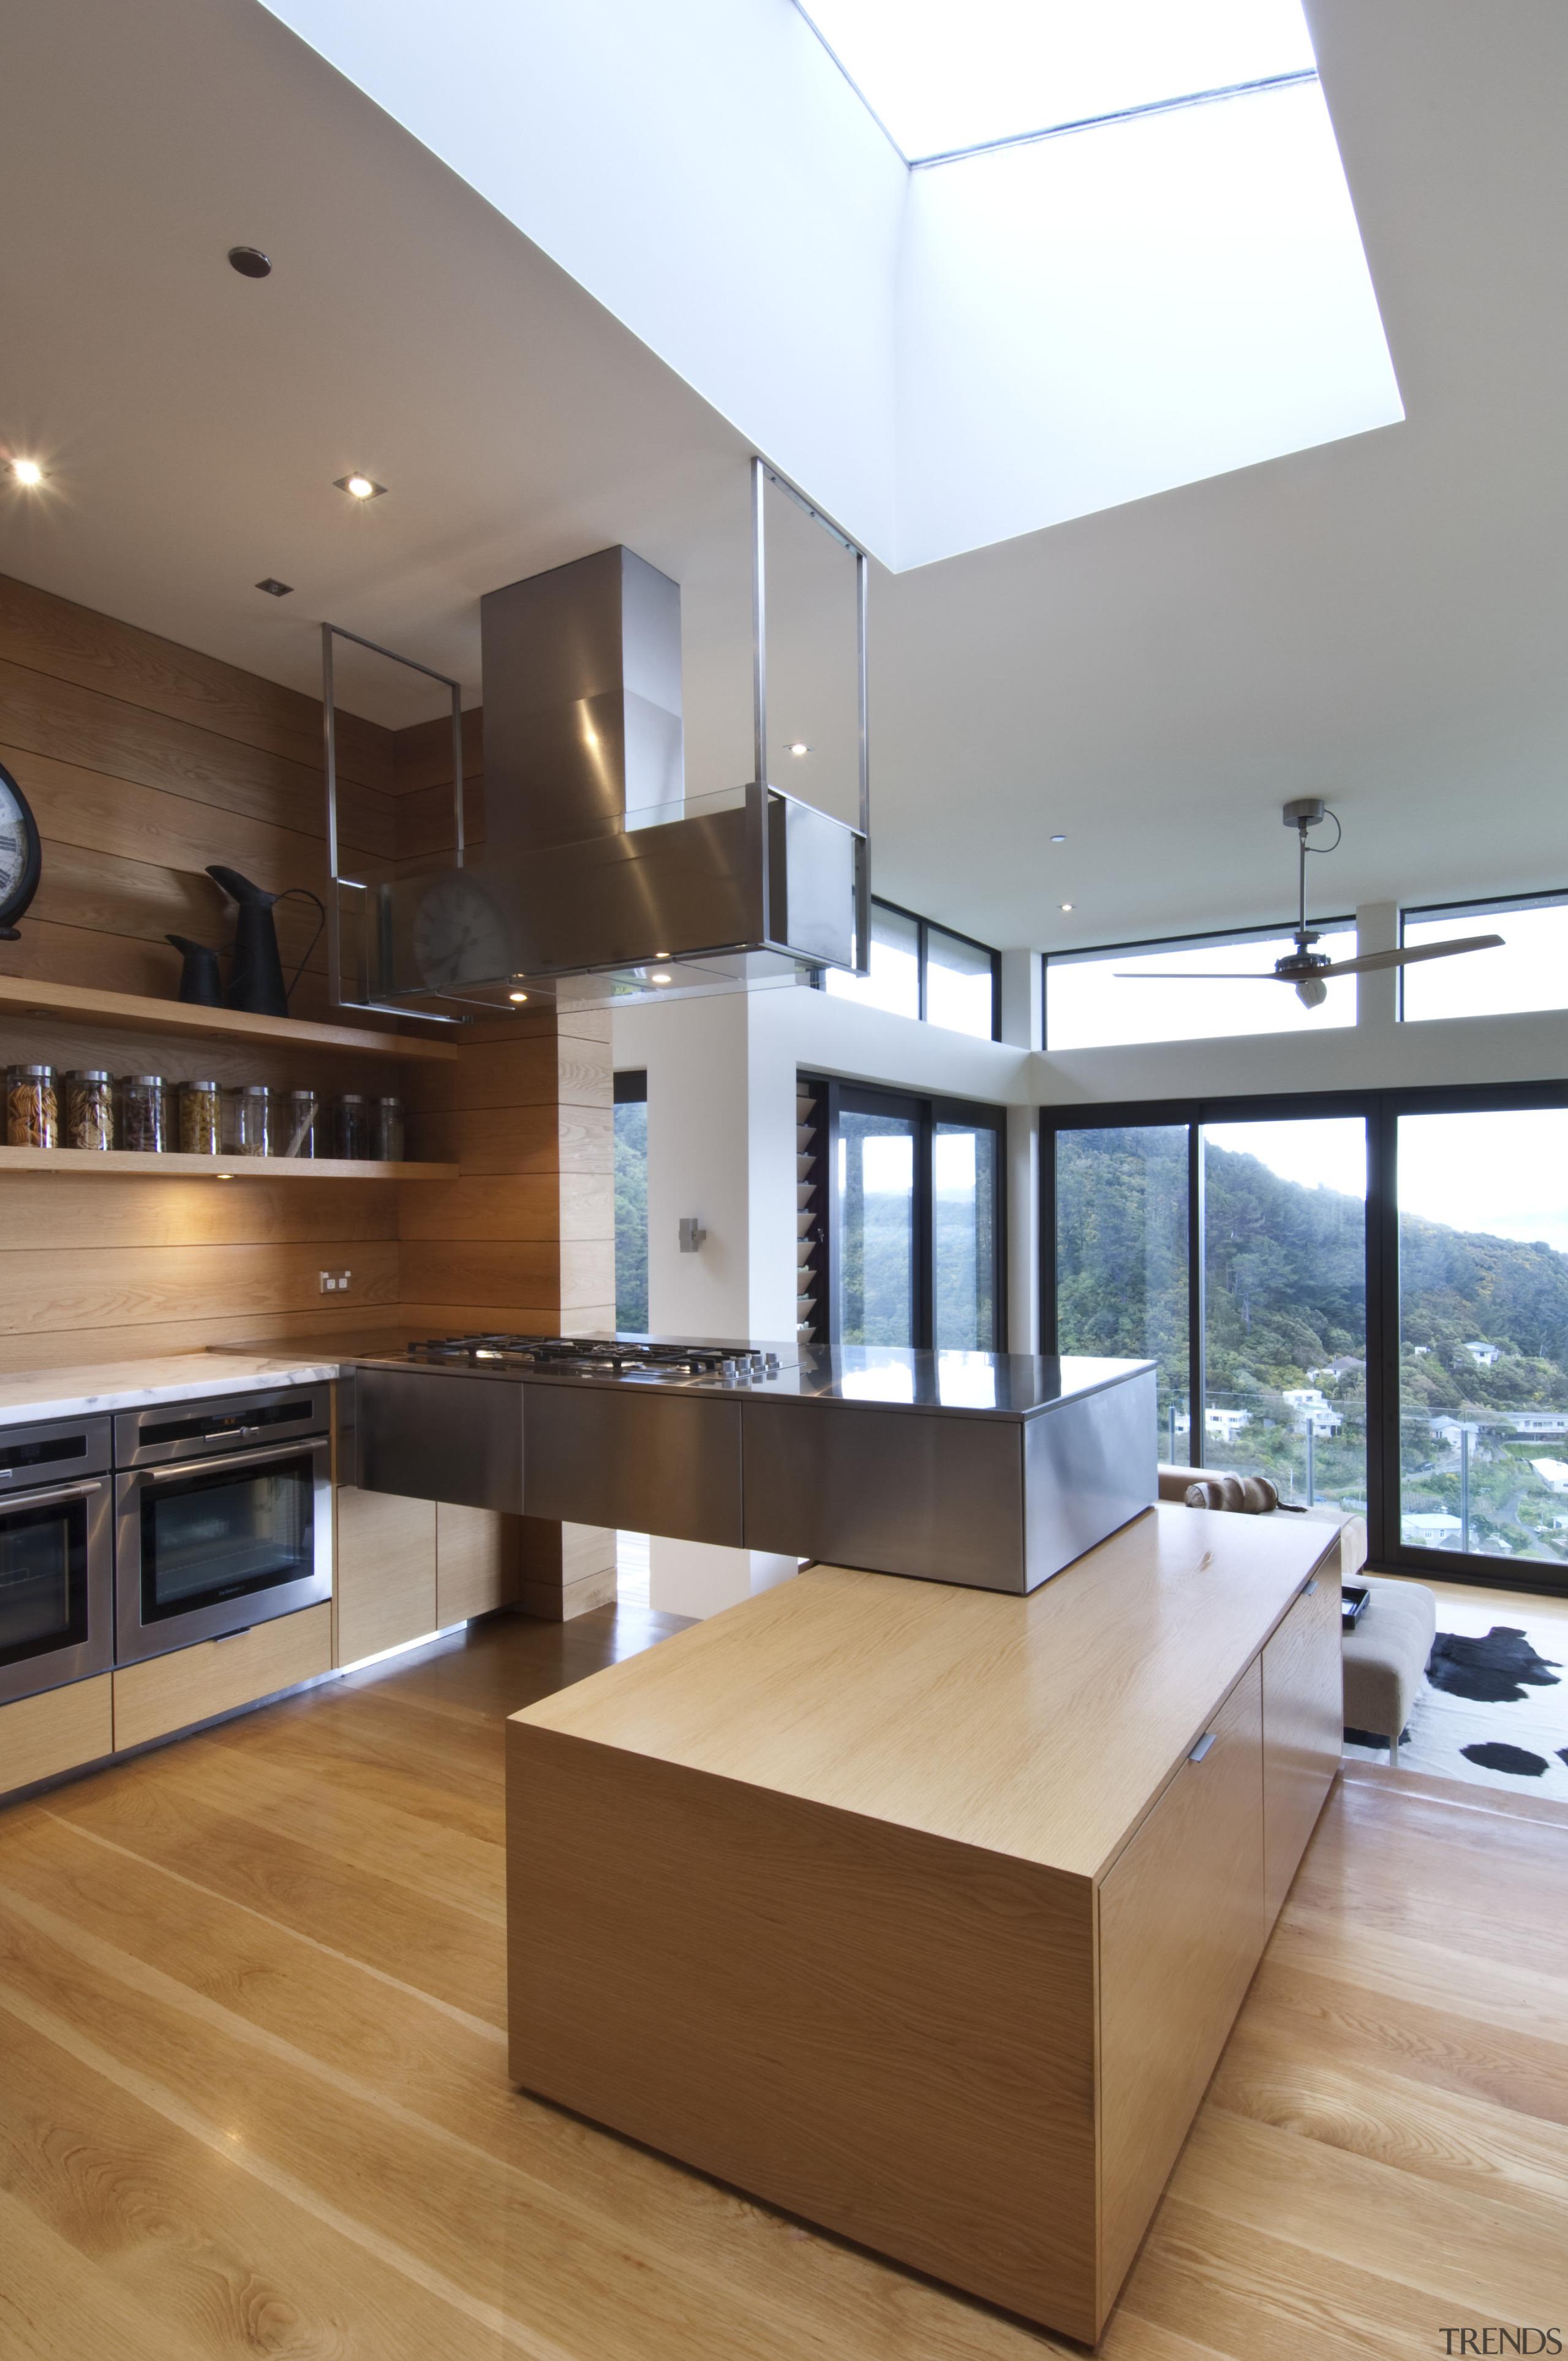 Raised floor kitchen. Stainless steel Binova cooktop. American architecture, cabinetry, countertop, cuisine classique, daylighting, floor, hardwood, interior design, kitchen, living room, real estate, wood flooring, brown